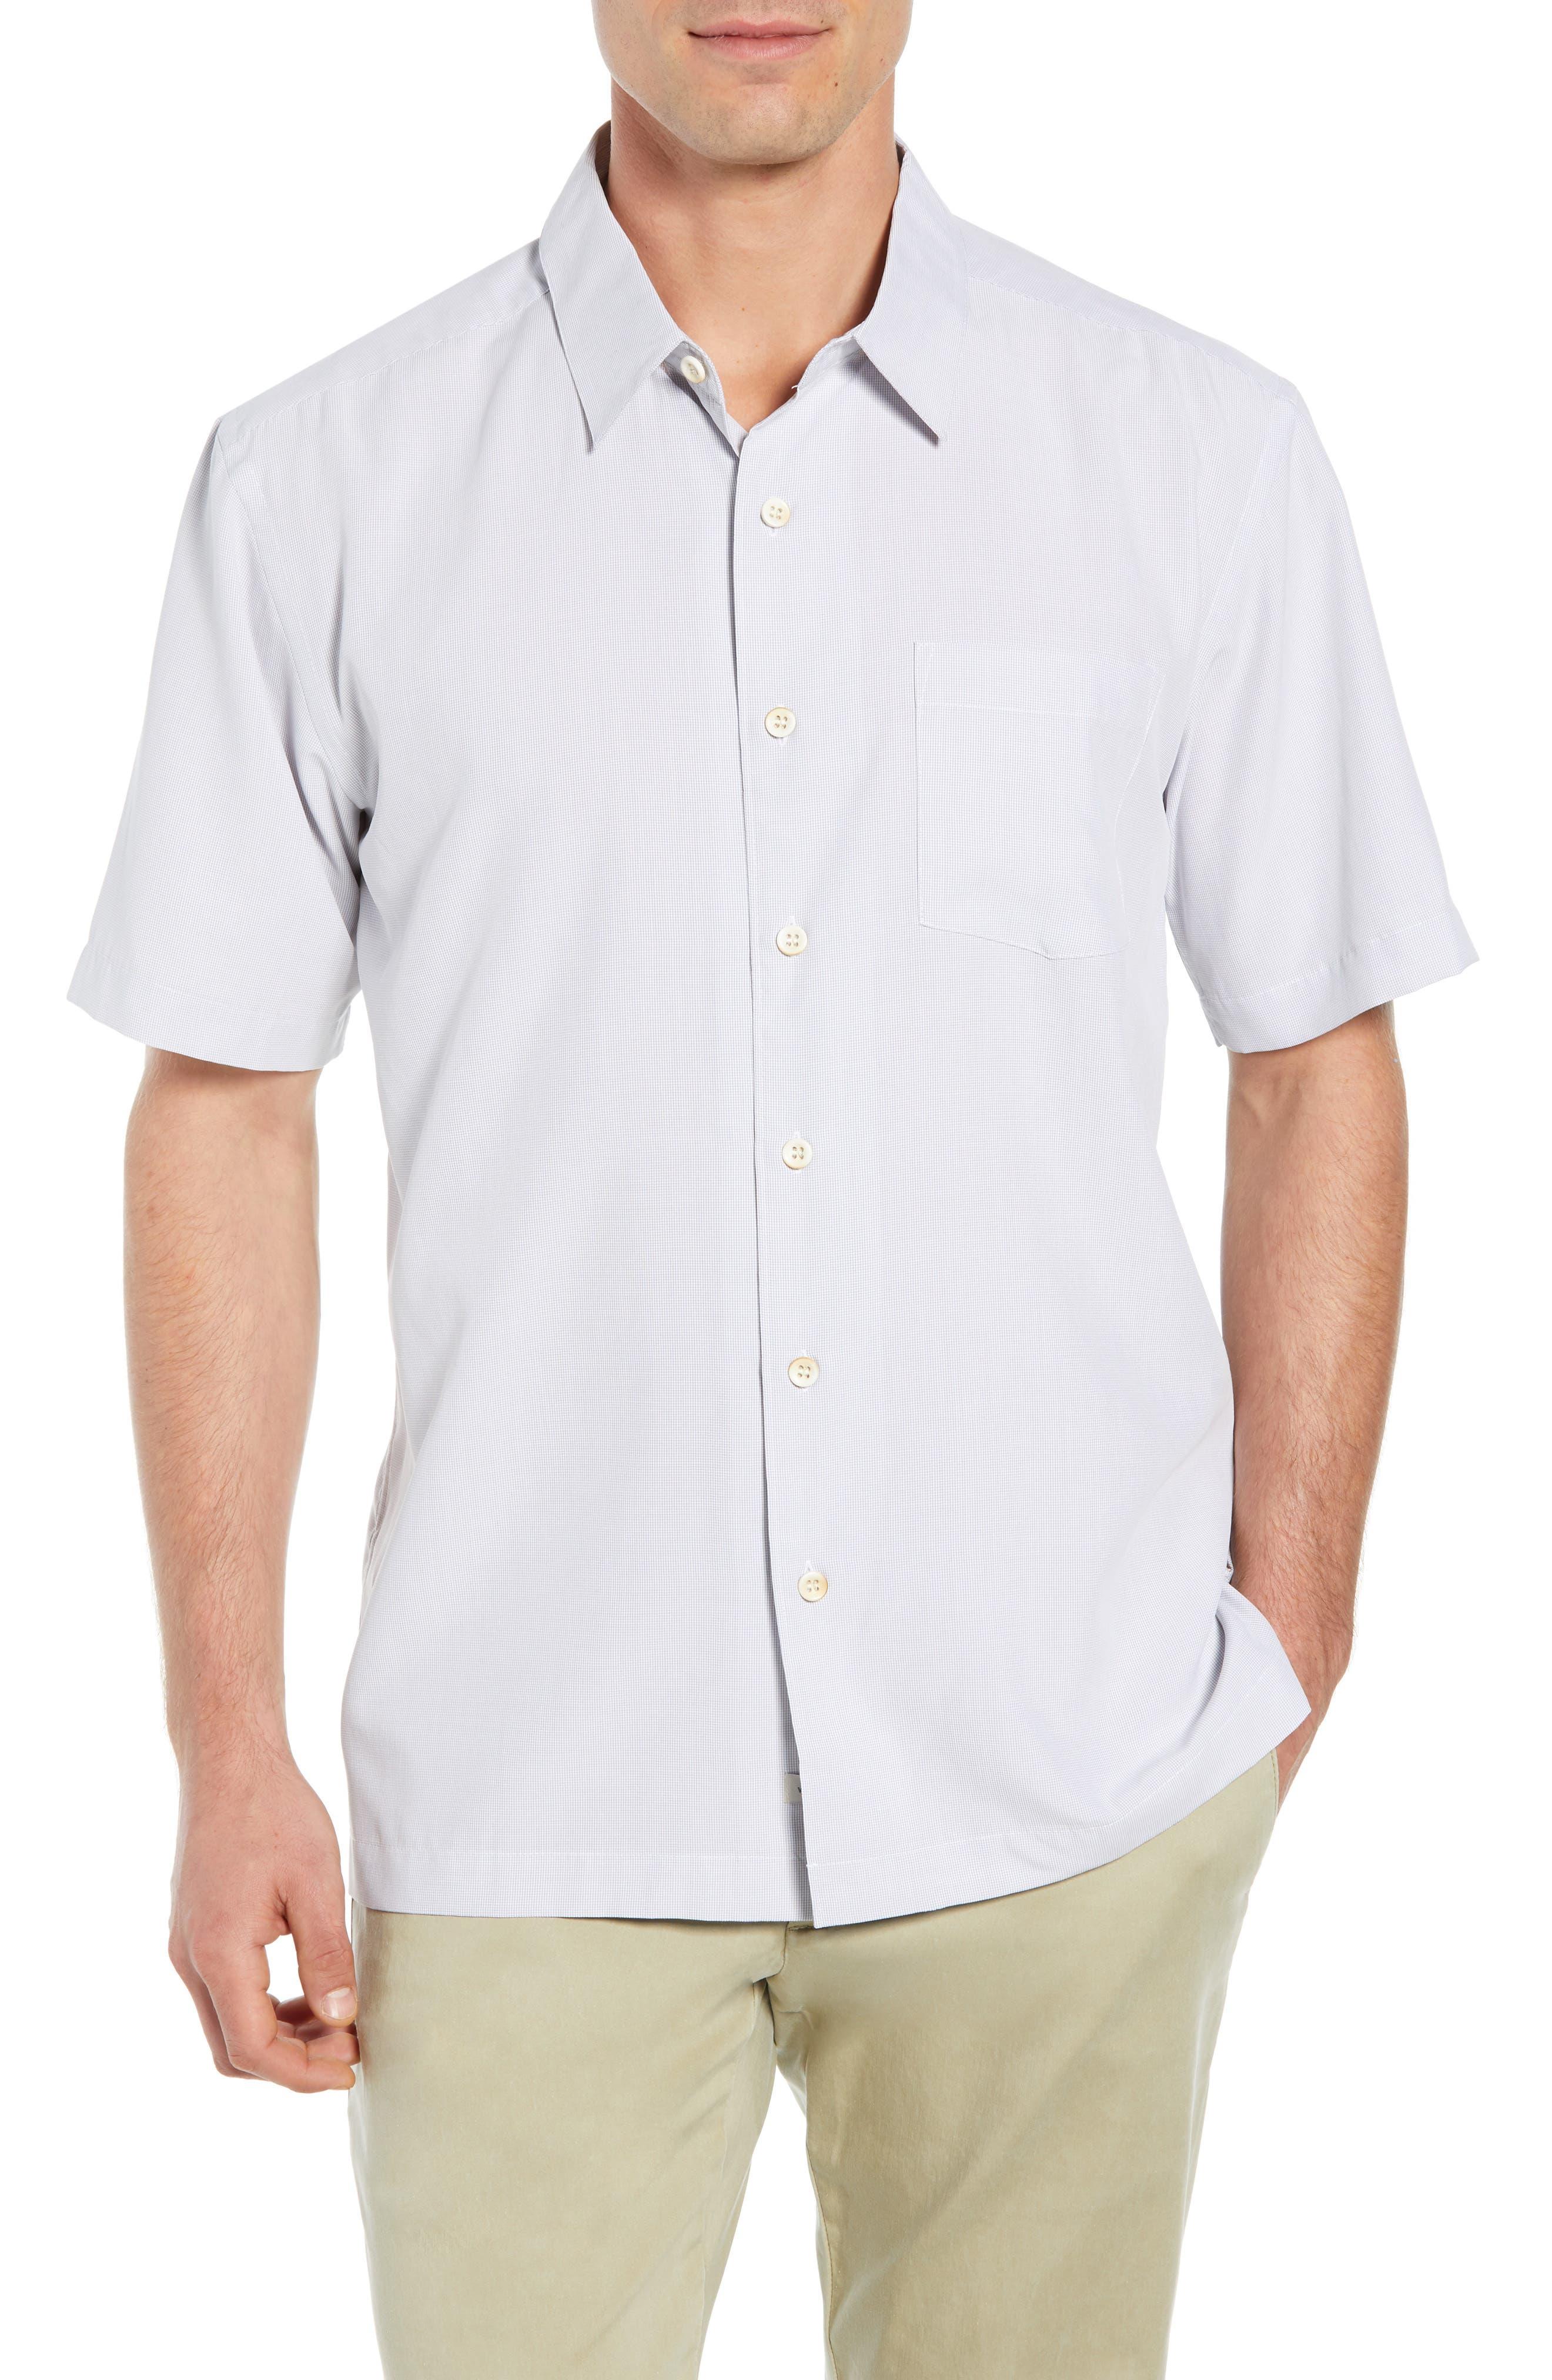 Cane Island Classic Fit Camp Shirt,                         Main,                         color, 101